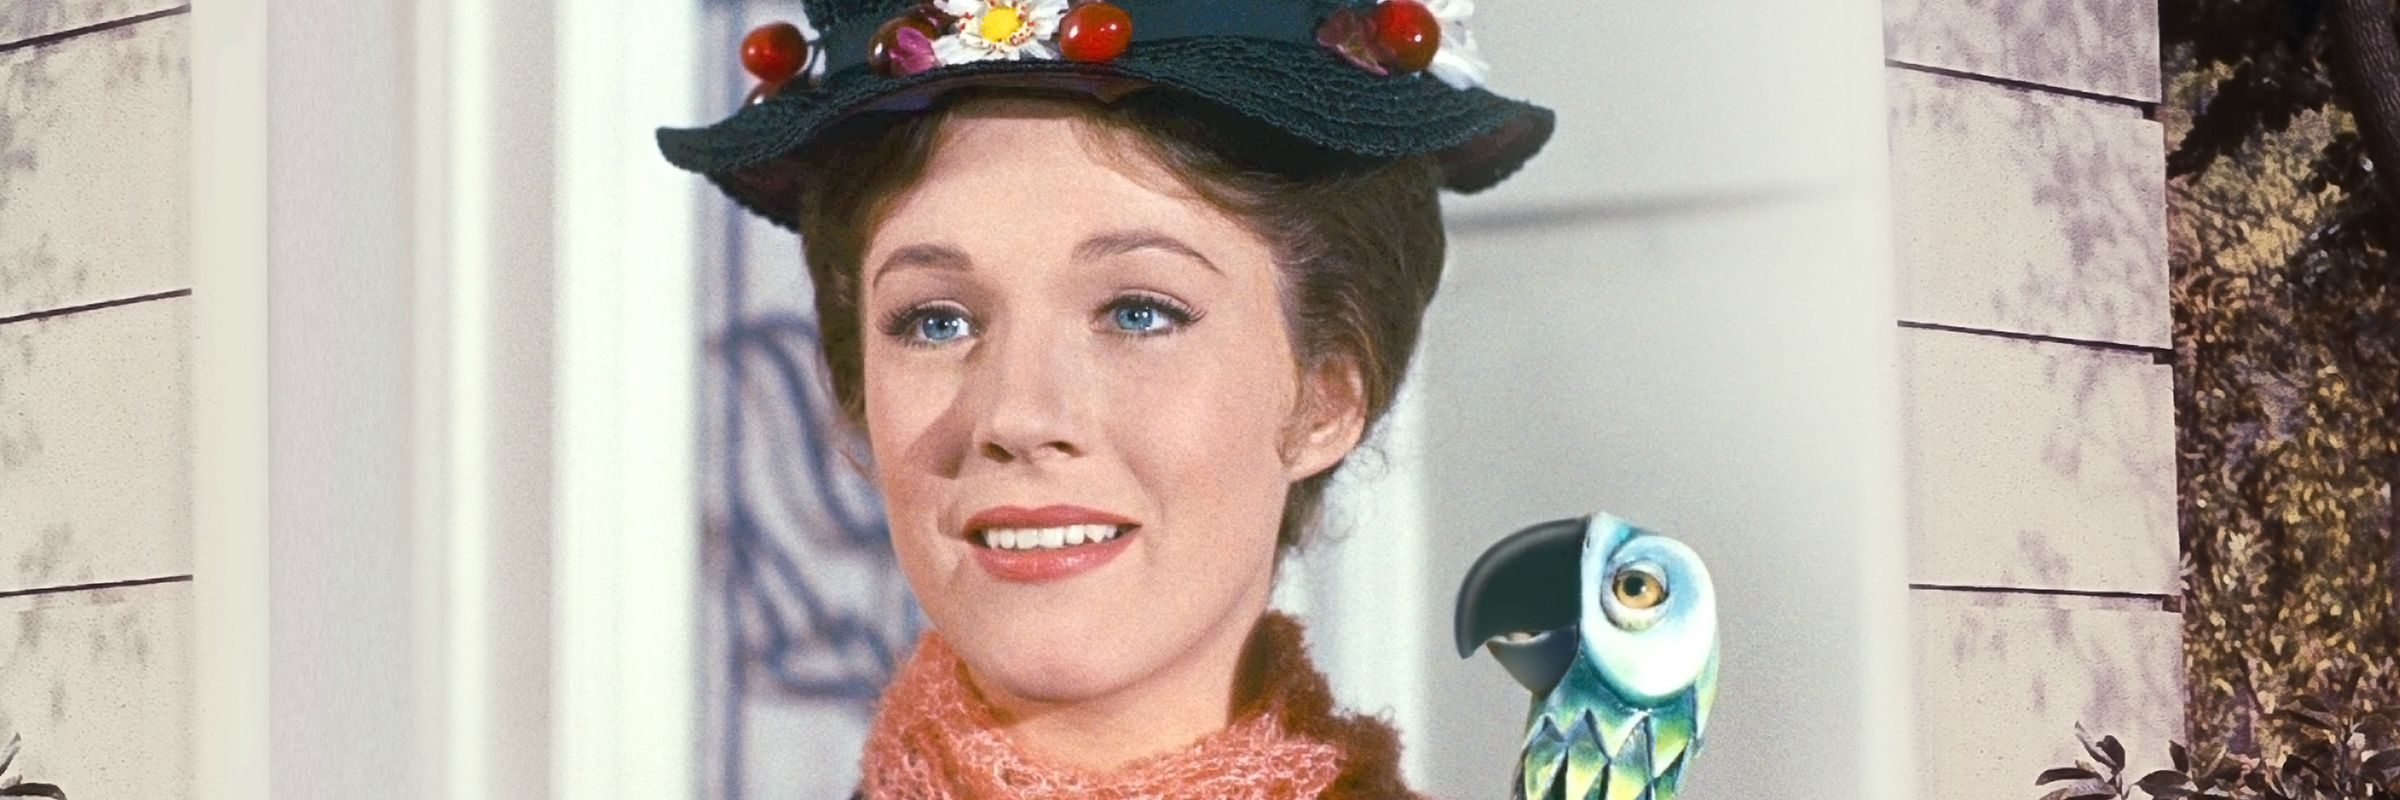 Mary Poppins Full Movie Movies Anywhere